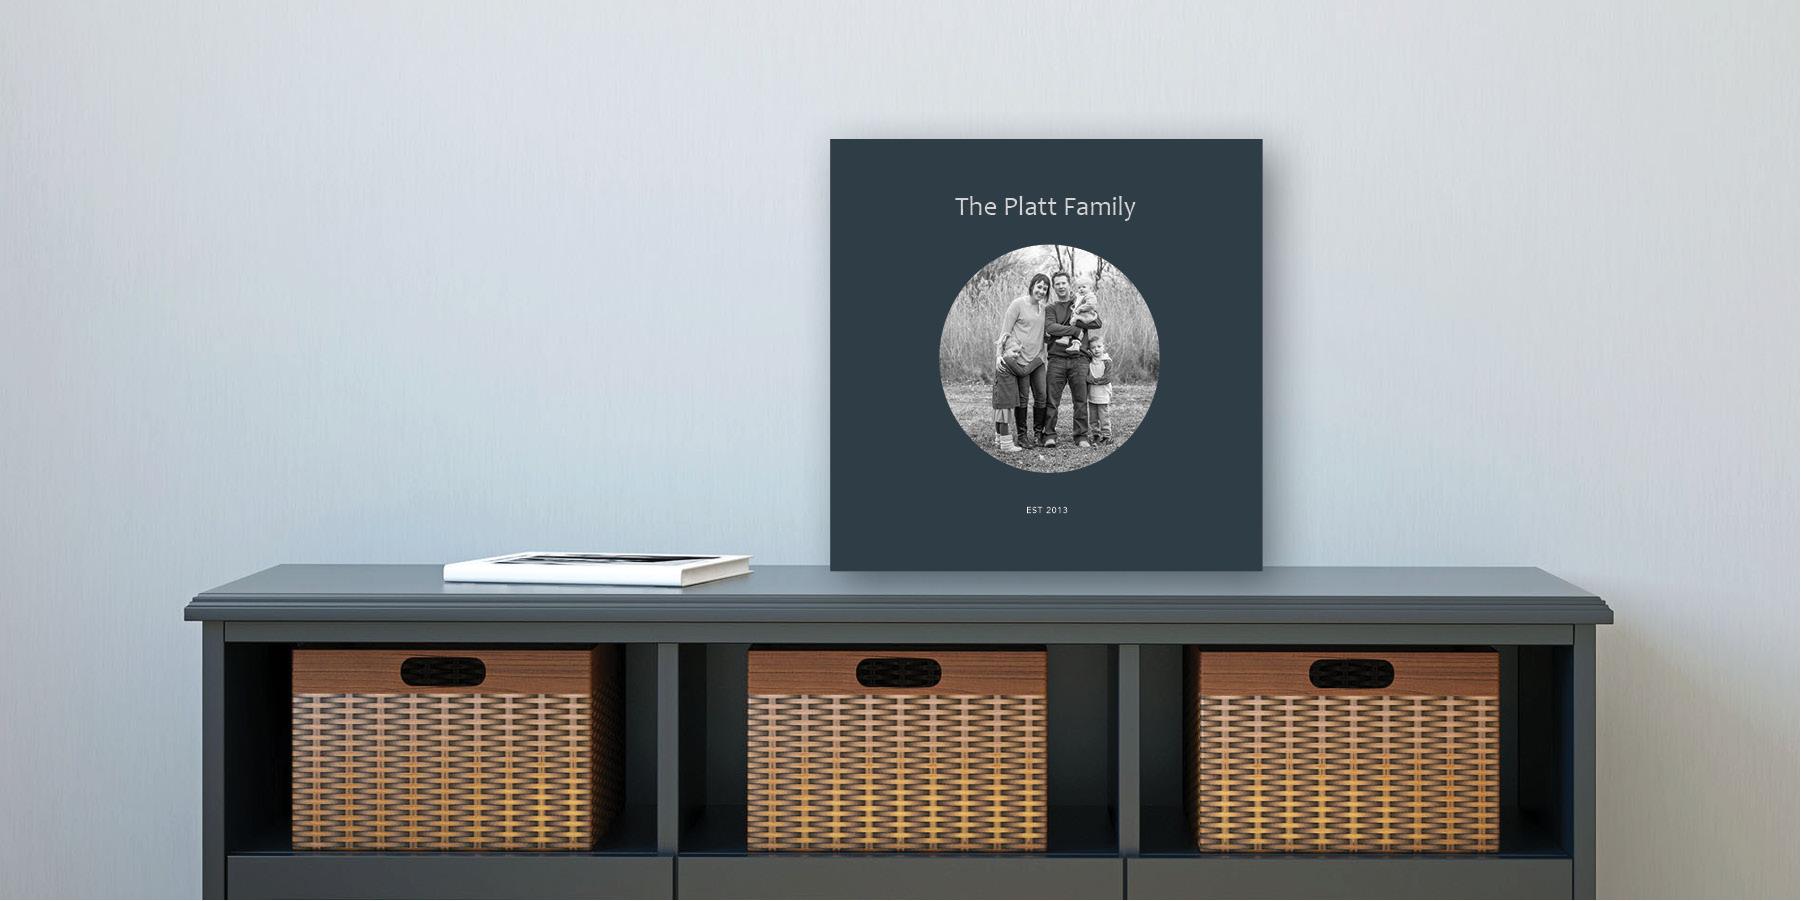 Family photo album on a table.